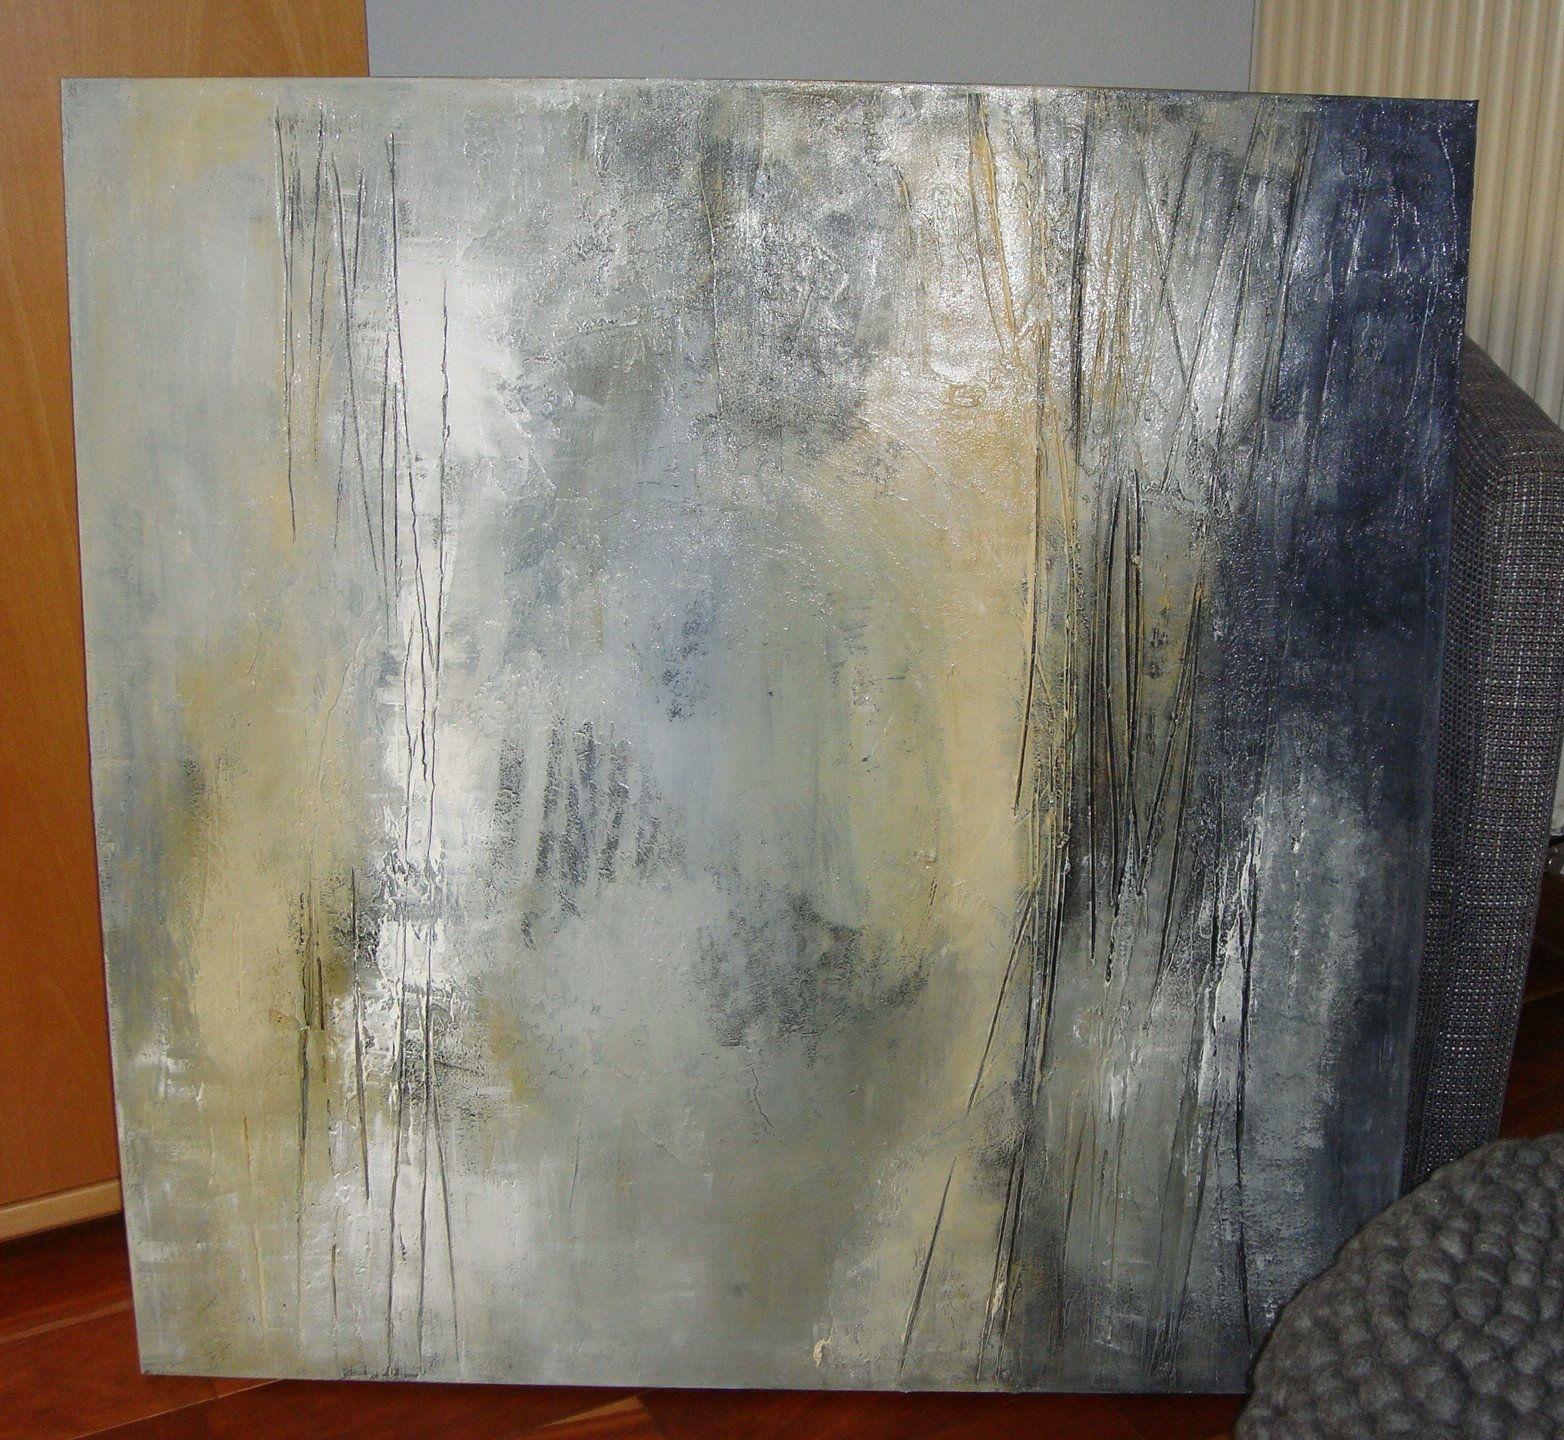 abstract image 90 x cm acrylic painting warm colors canvas riginal grey blue yellow beige handmade picture with structure acrylbilder abstrakt grau abstraktes bild kaufen